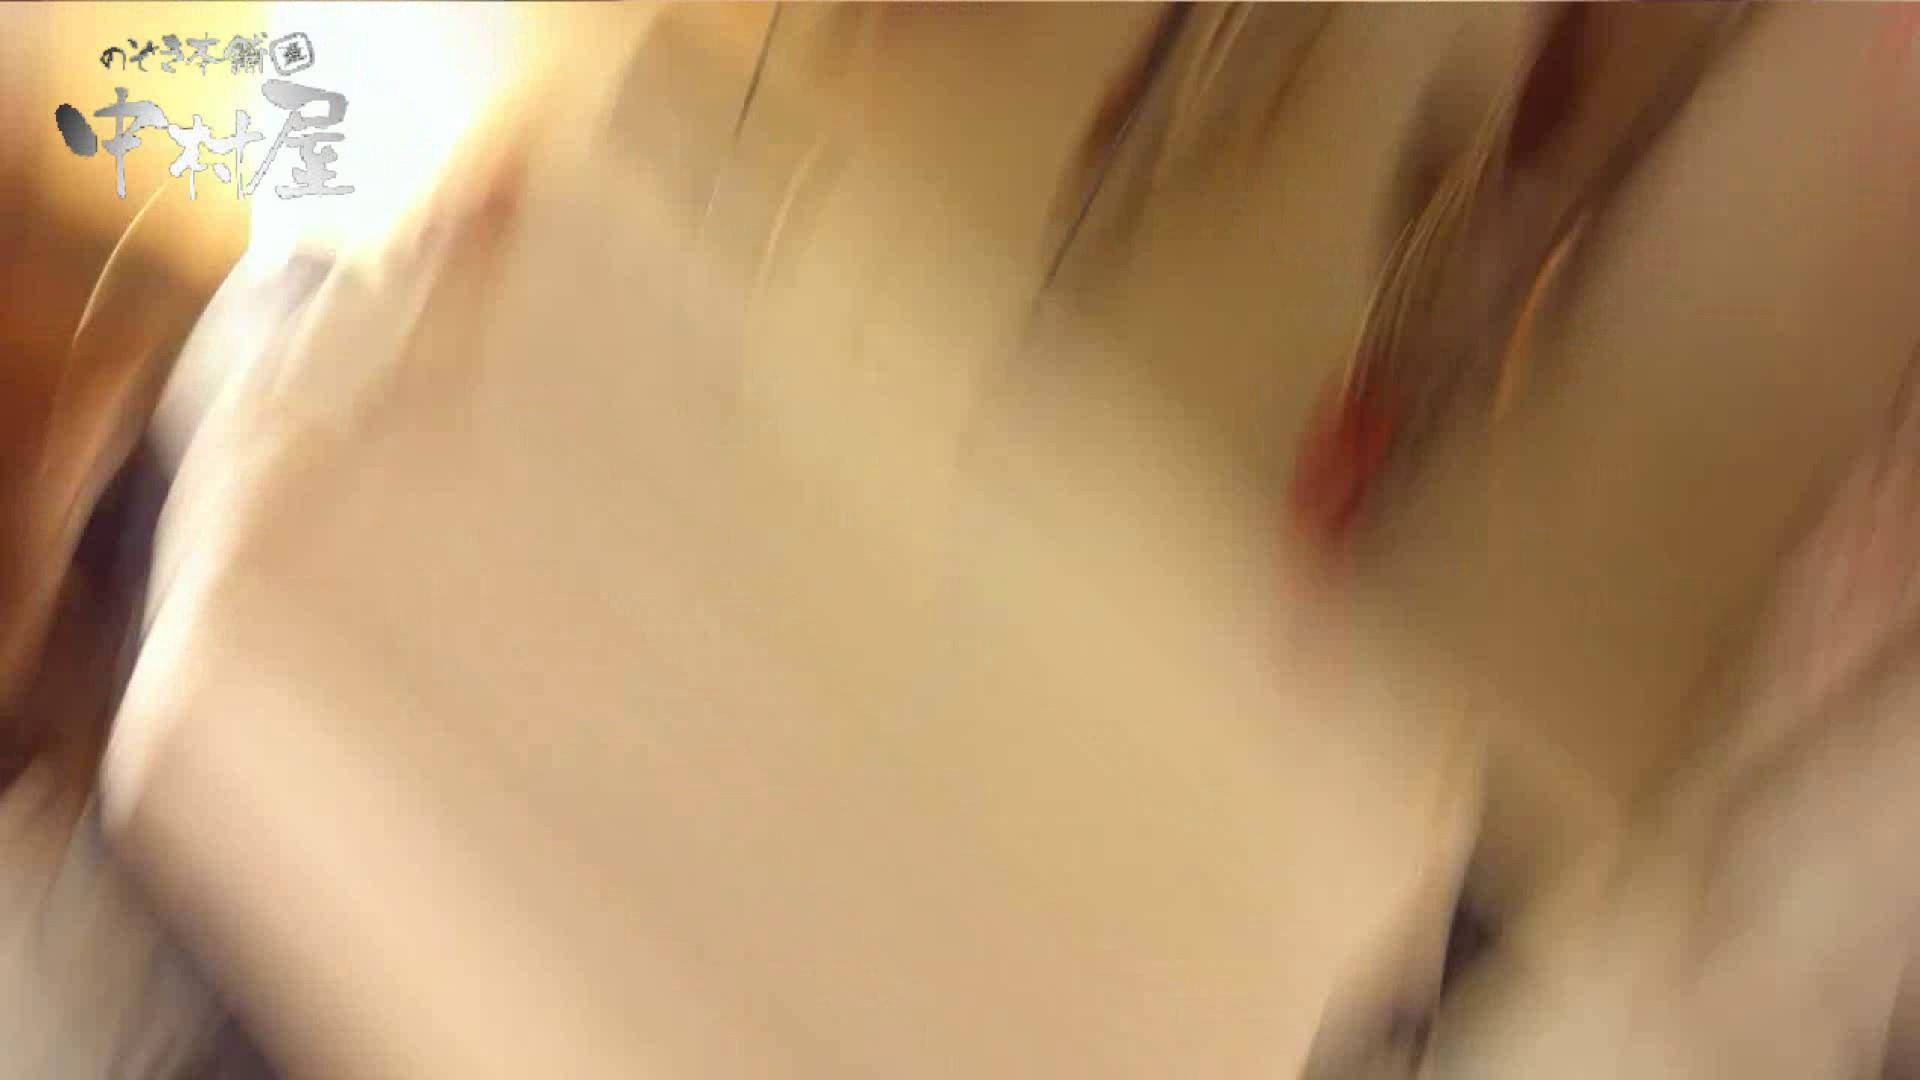 vol.66 美人アパレル胸チラ&パンチラ 店員さんのパンツはストライプ チラ歓迎 のぞき動画画像 100pic 87